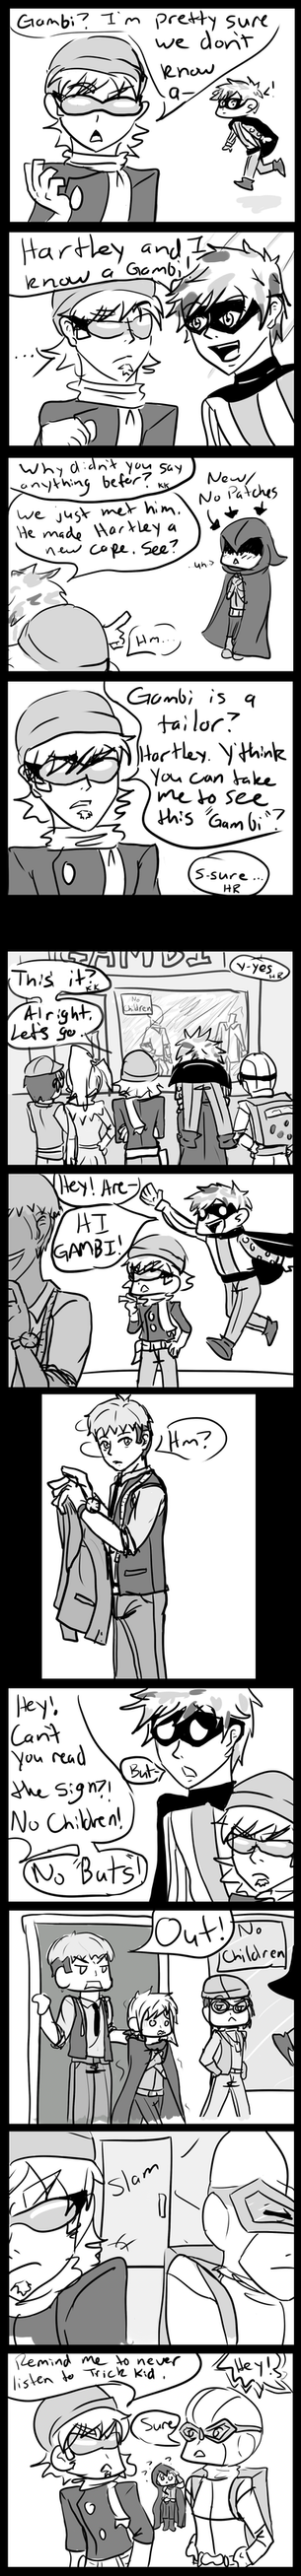 Teen Rogues Meet Gambi by FullmetalApollo